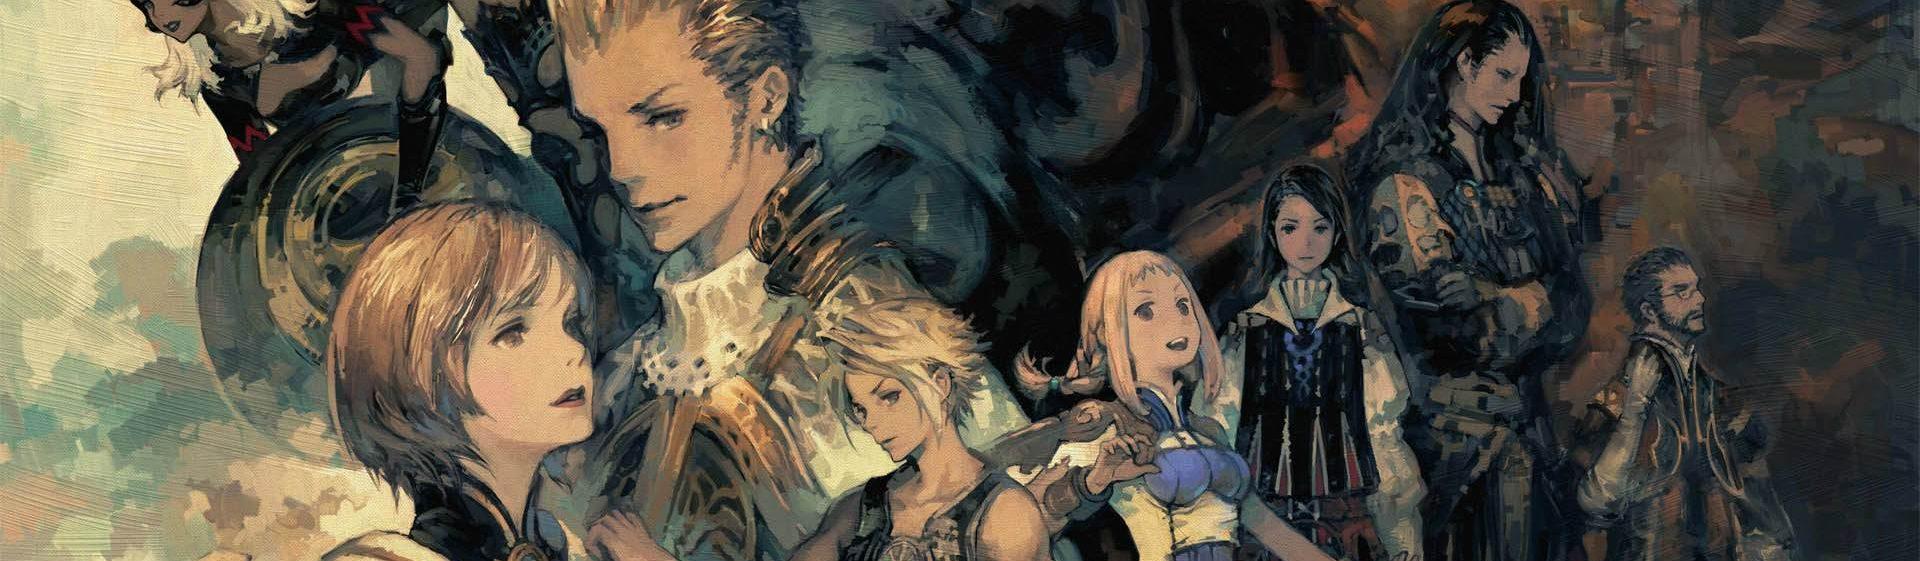 Final Fantasy XII: The Zodiac Age - Đánh Giá Game